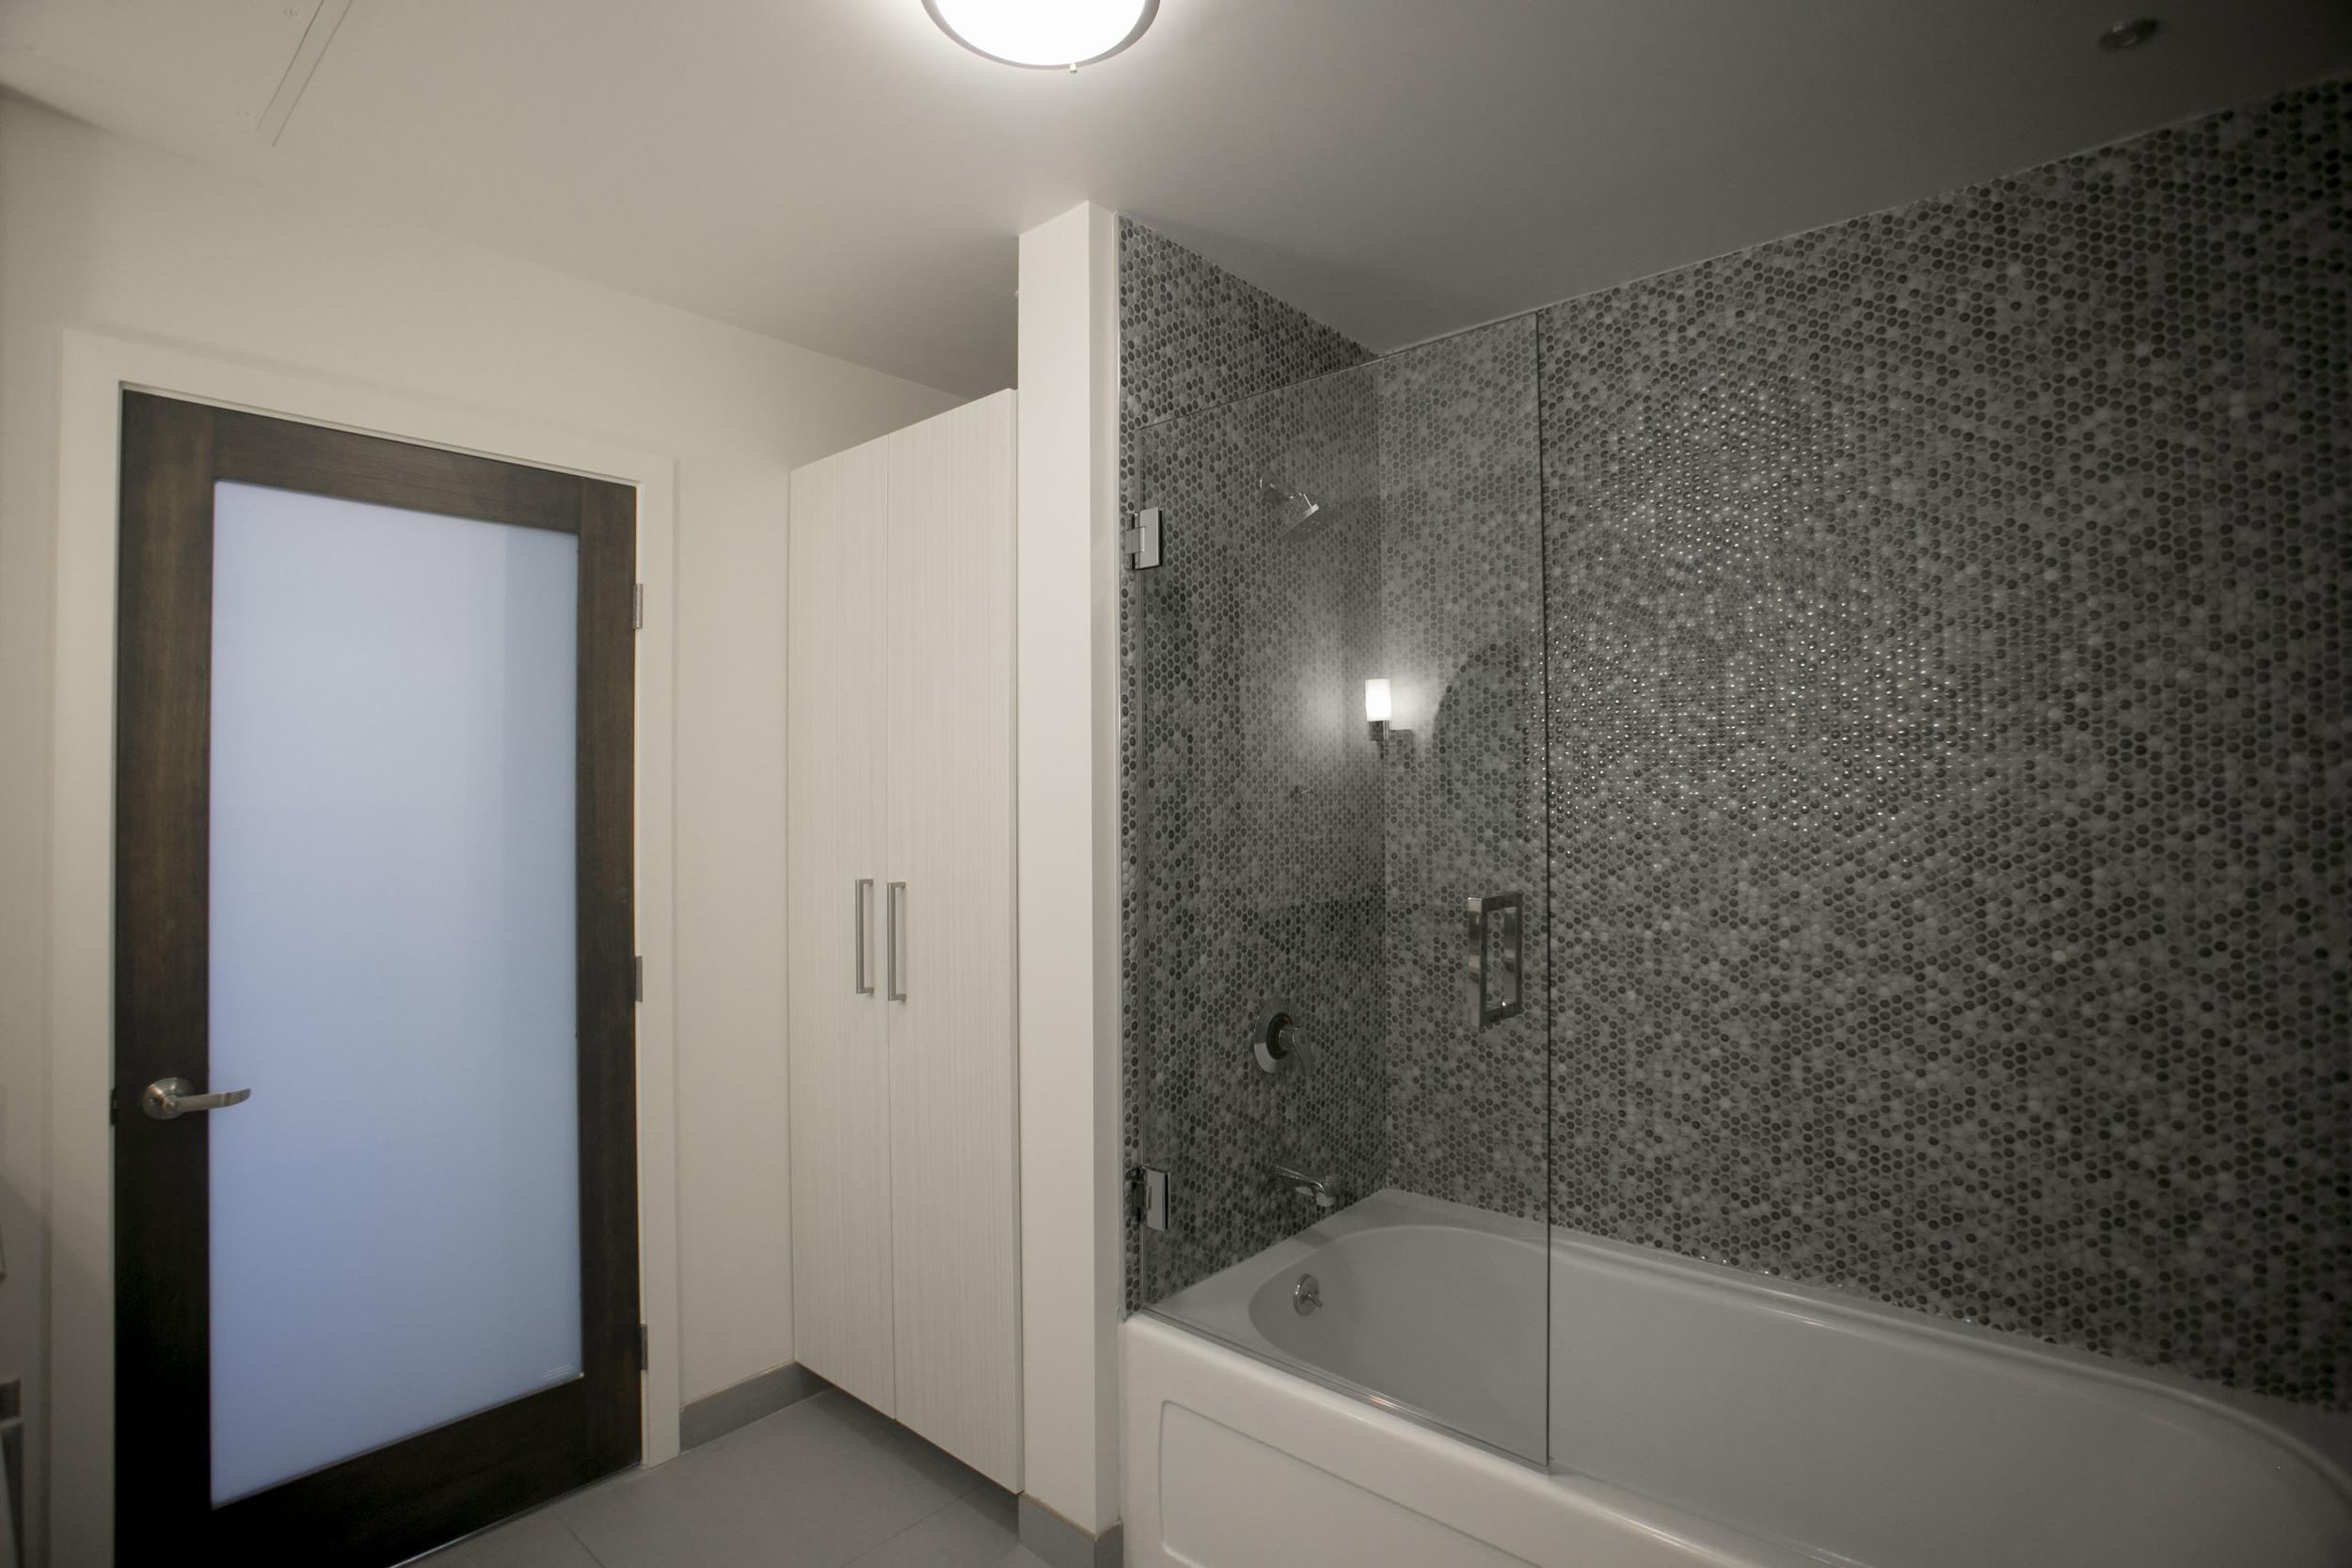 Shower Enclosure at Garment Lofts